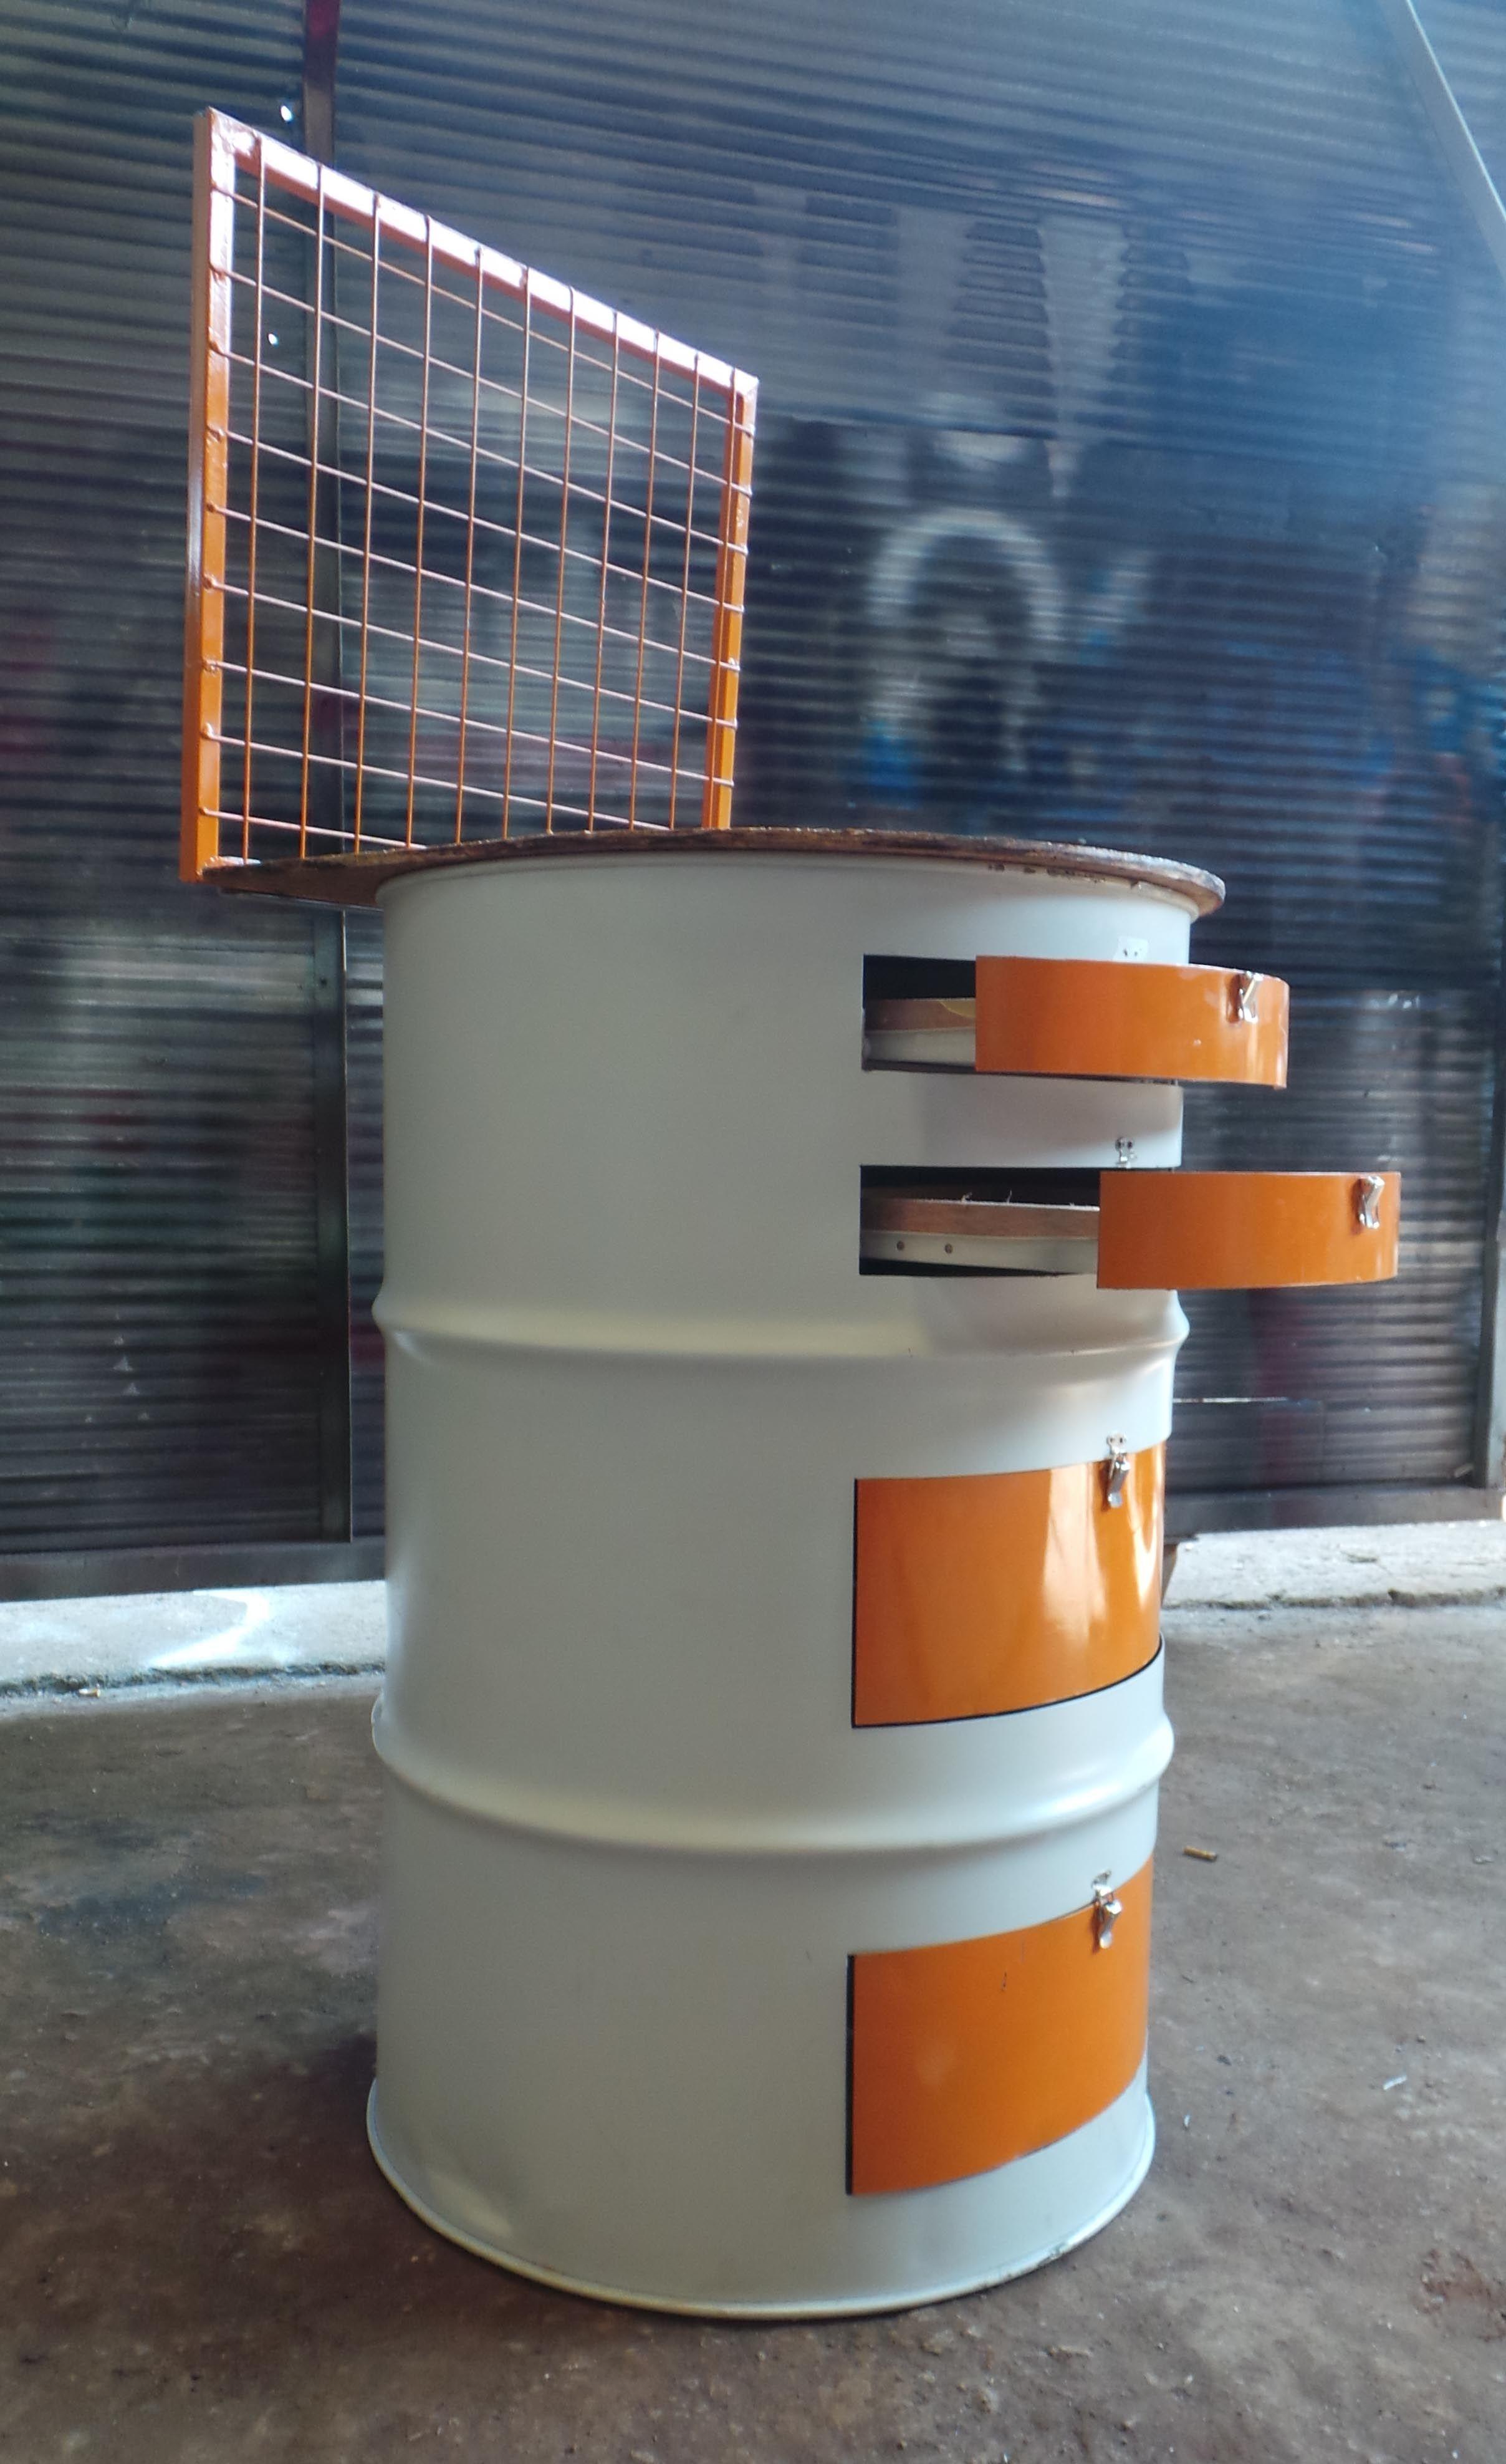 Drum Oil Recycle Client Mobworks Company Mesas De Salao Barril Ideias Para Barbearias